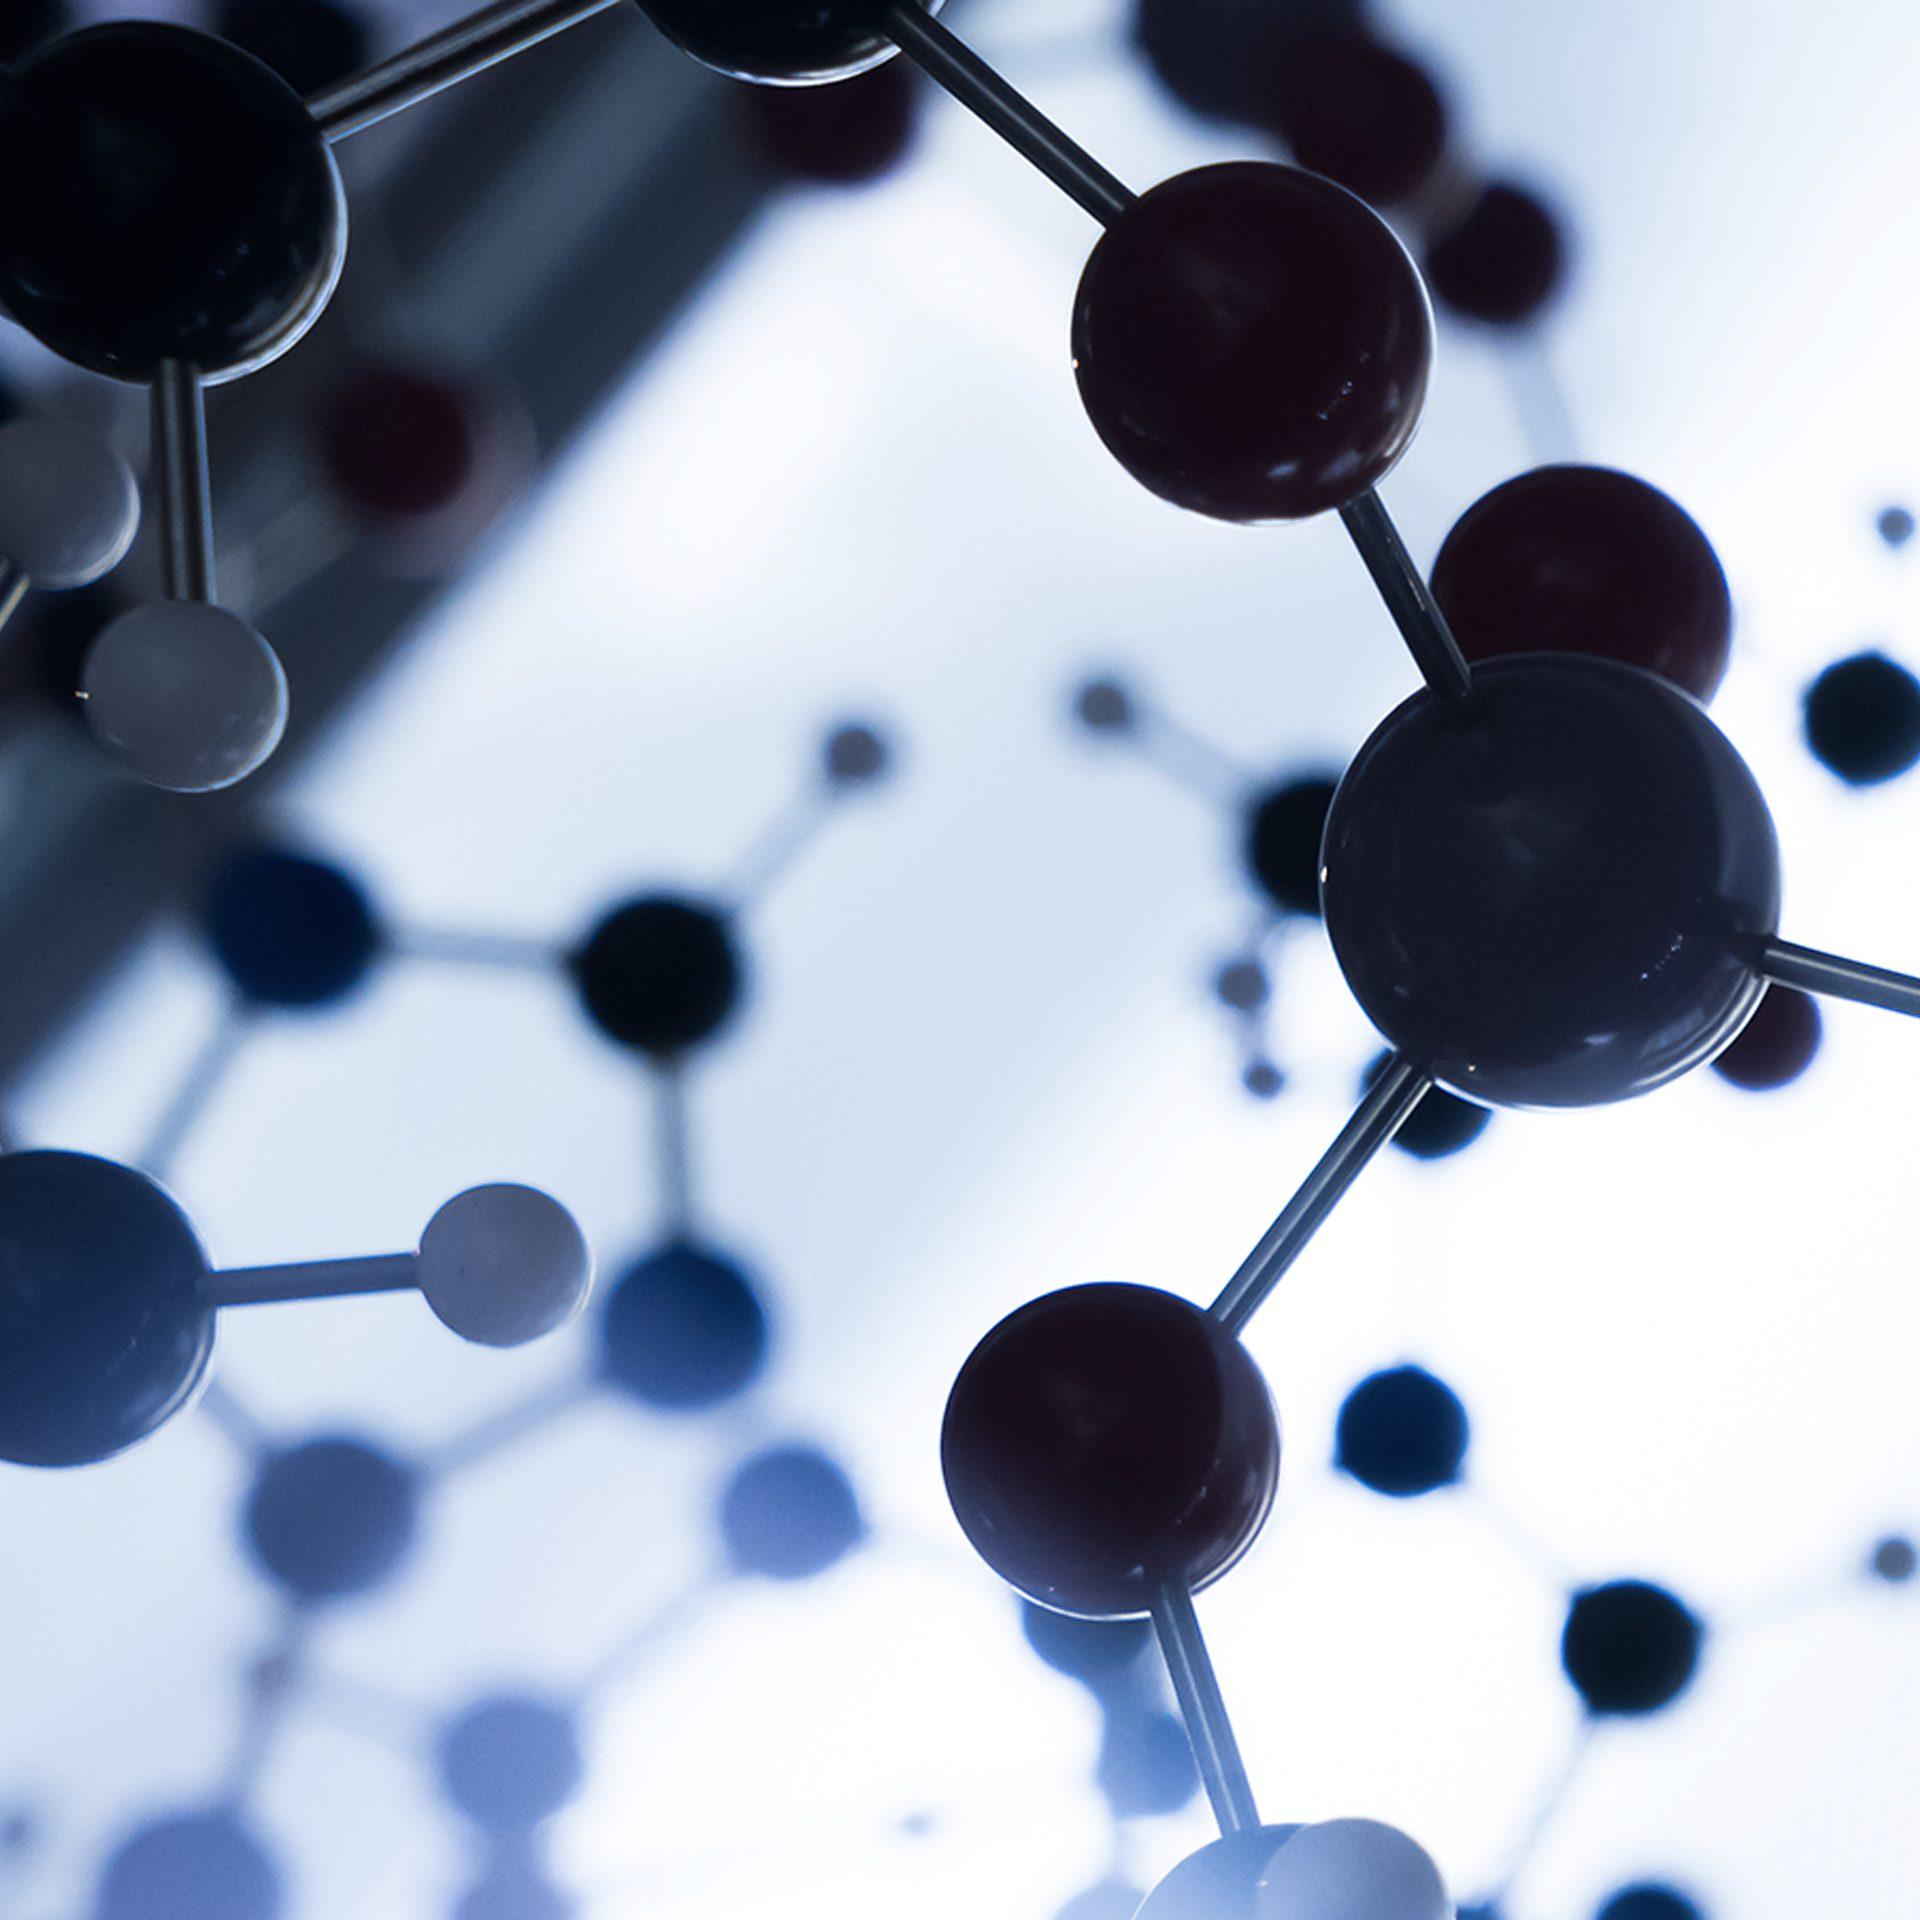 Life Sciences molecule featured image